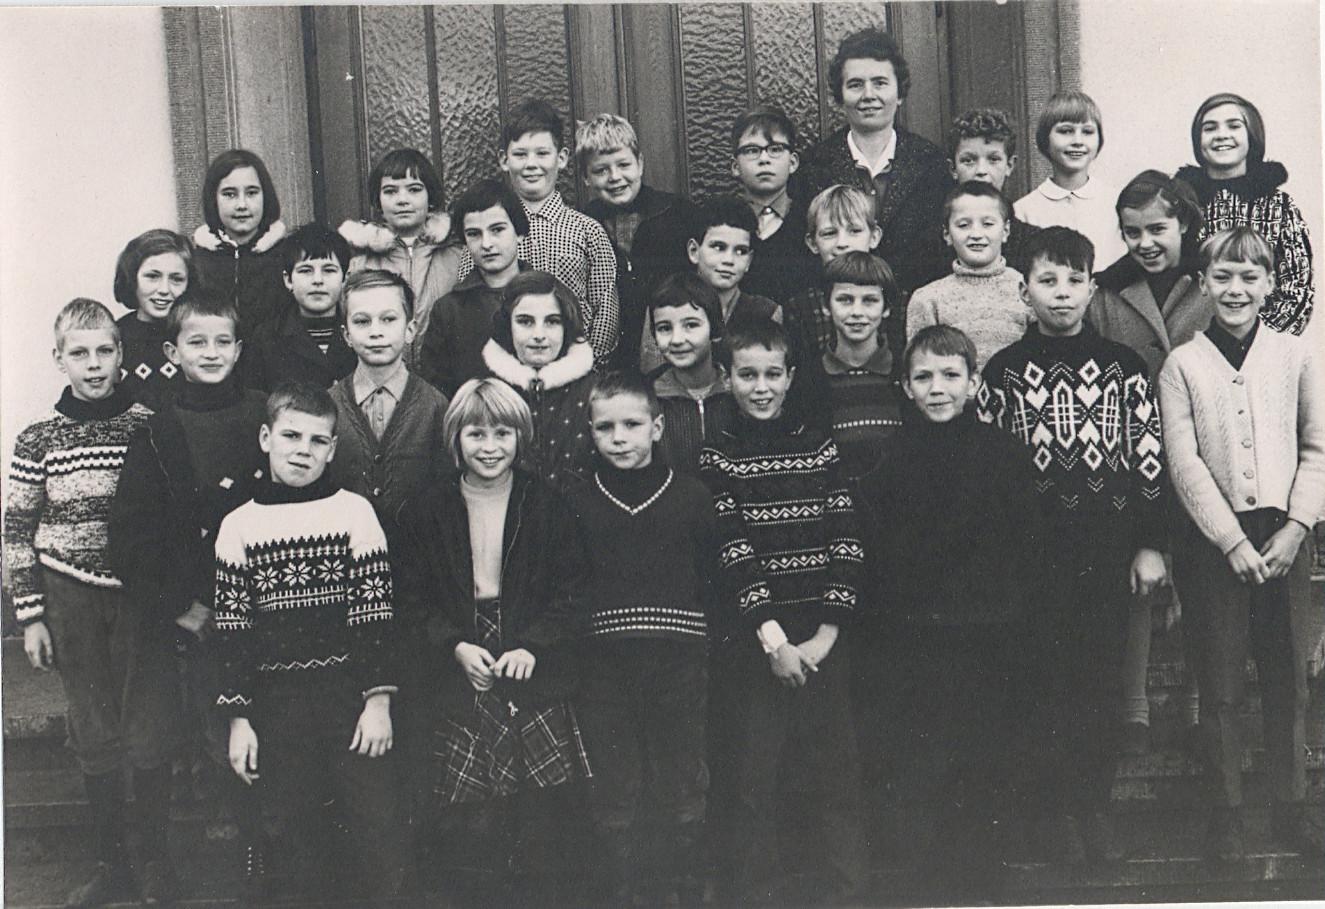 Jahrgang 1956, Bild: Beck,Alma